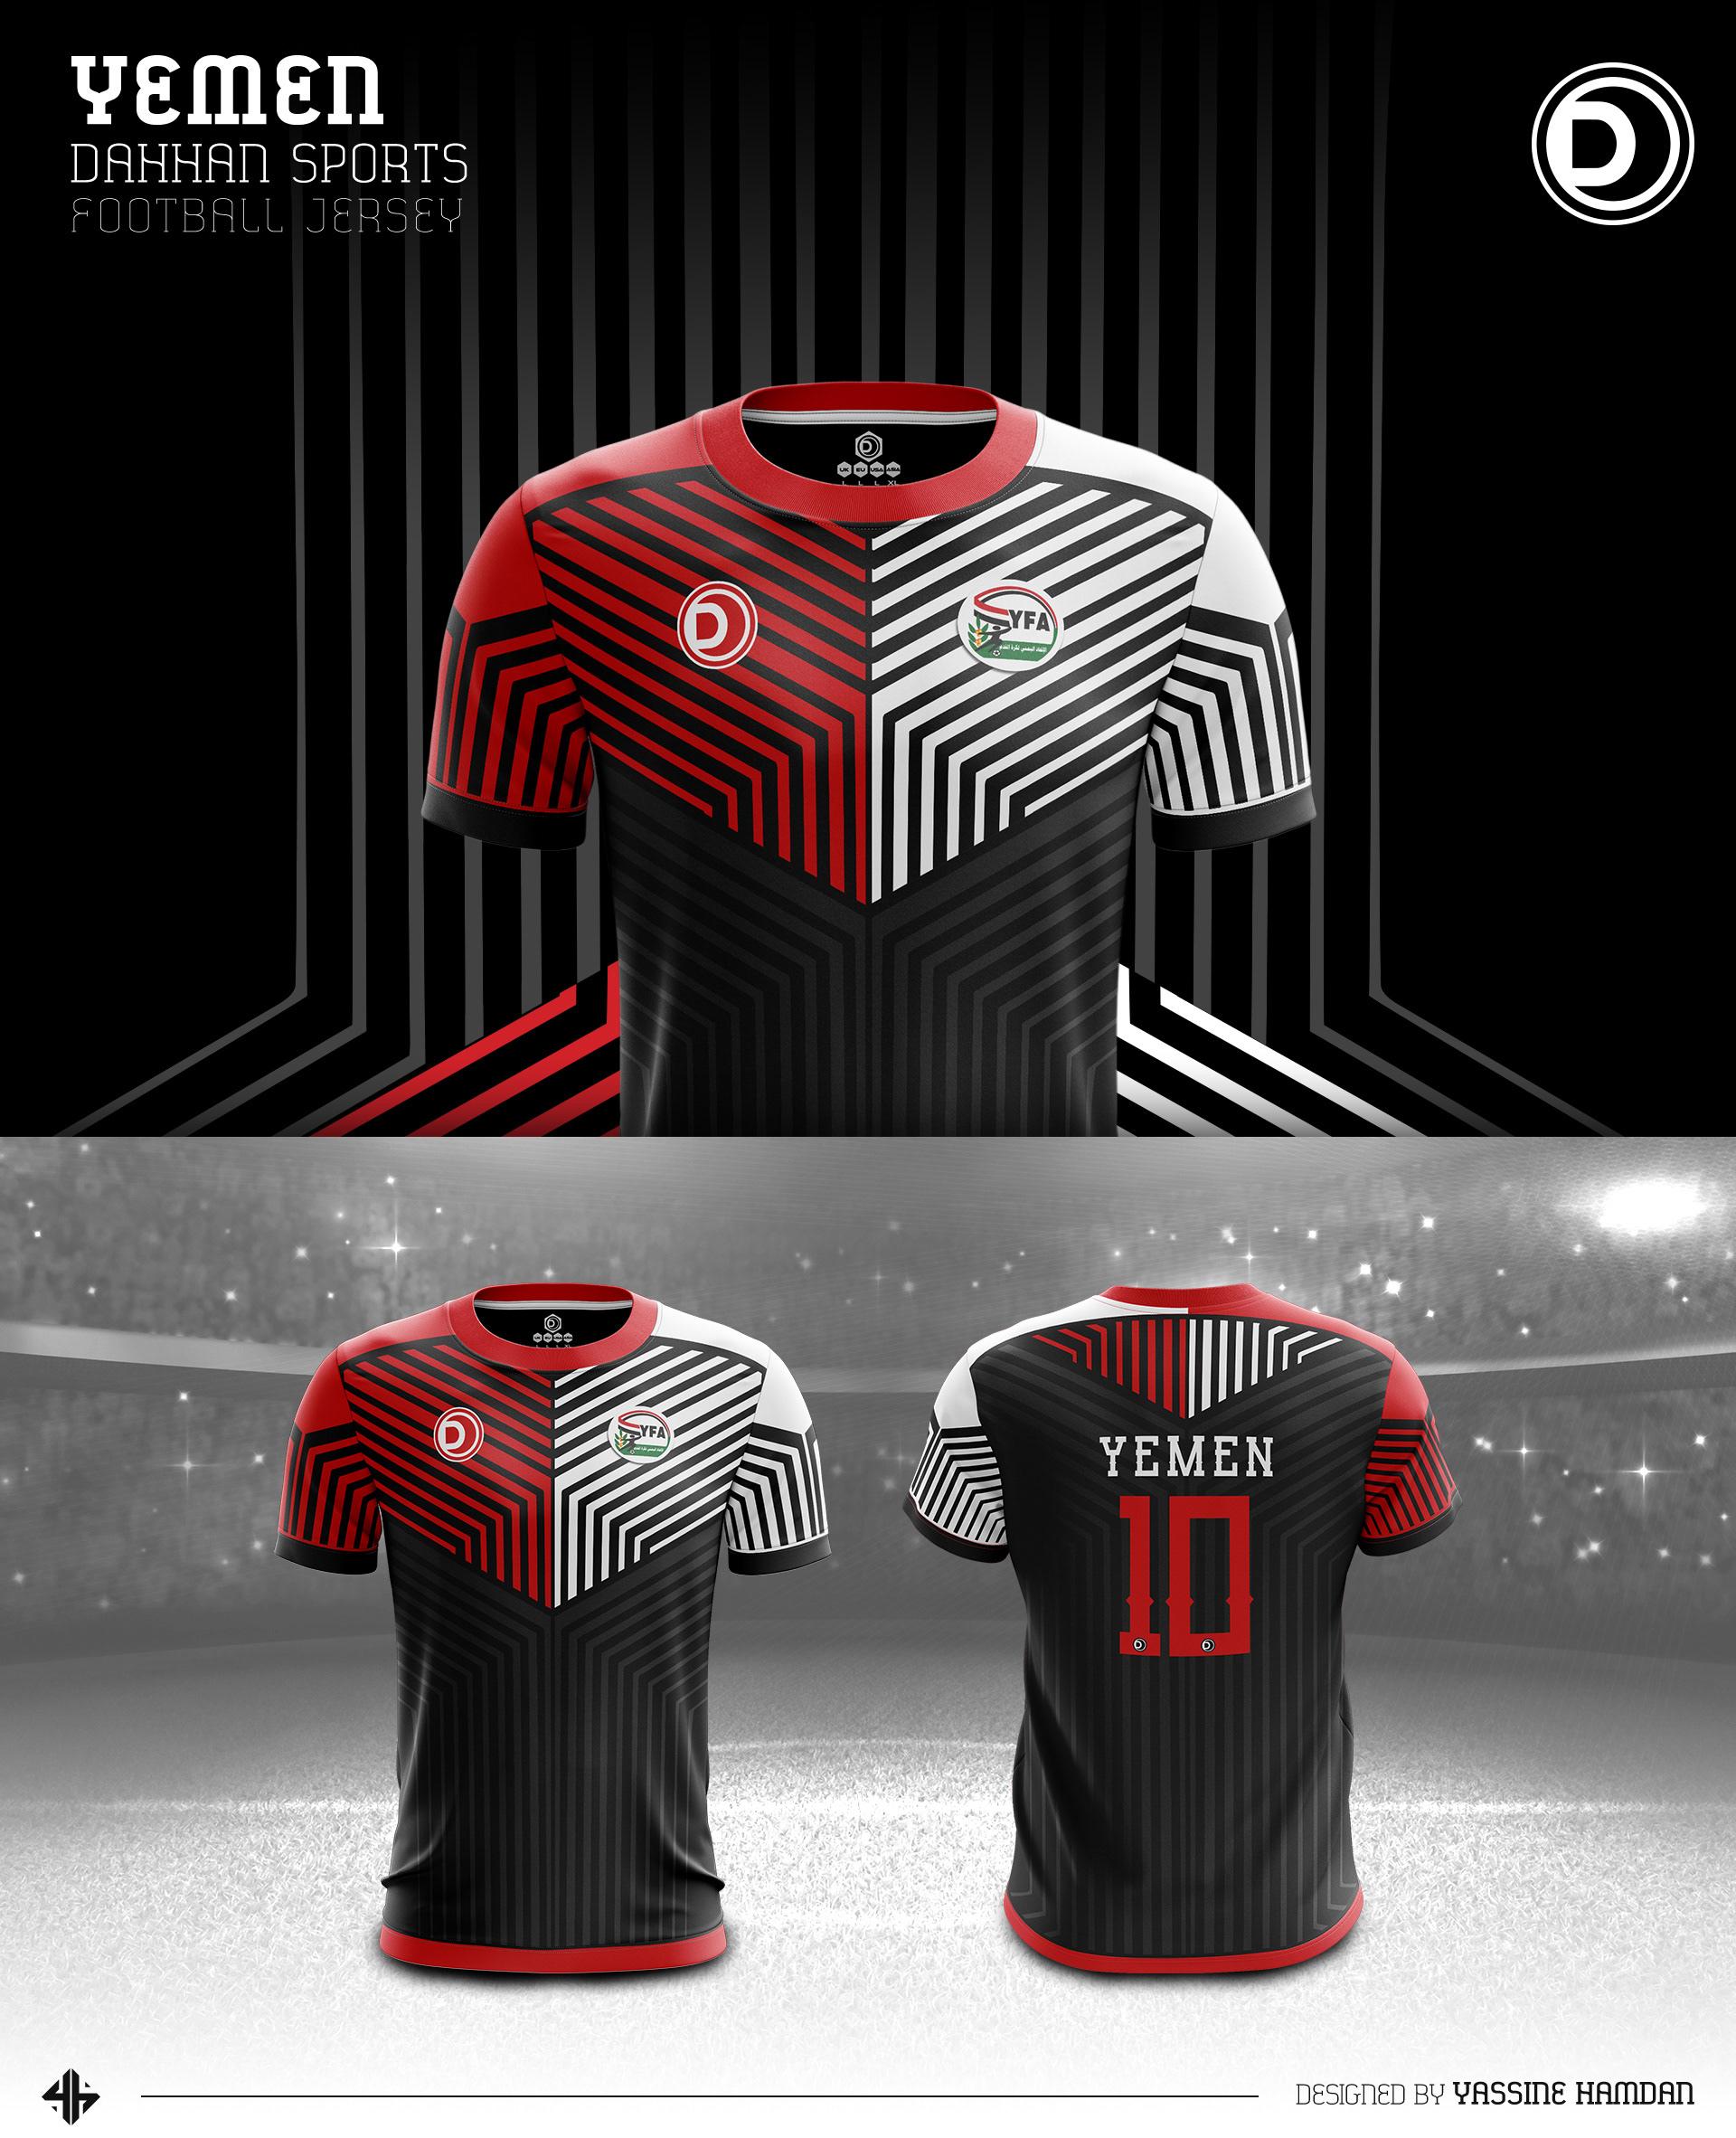 26e529c4d8e Dahhan Sports Football Kits on Behance